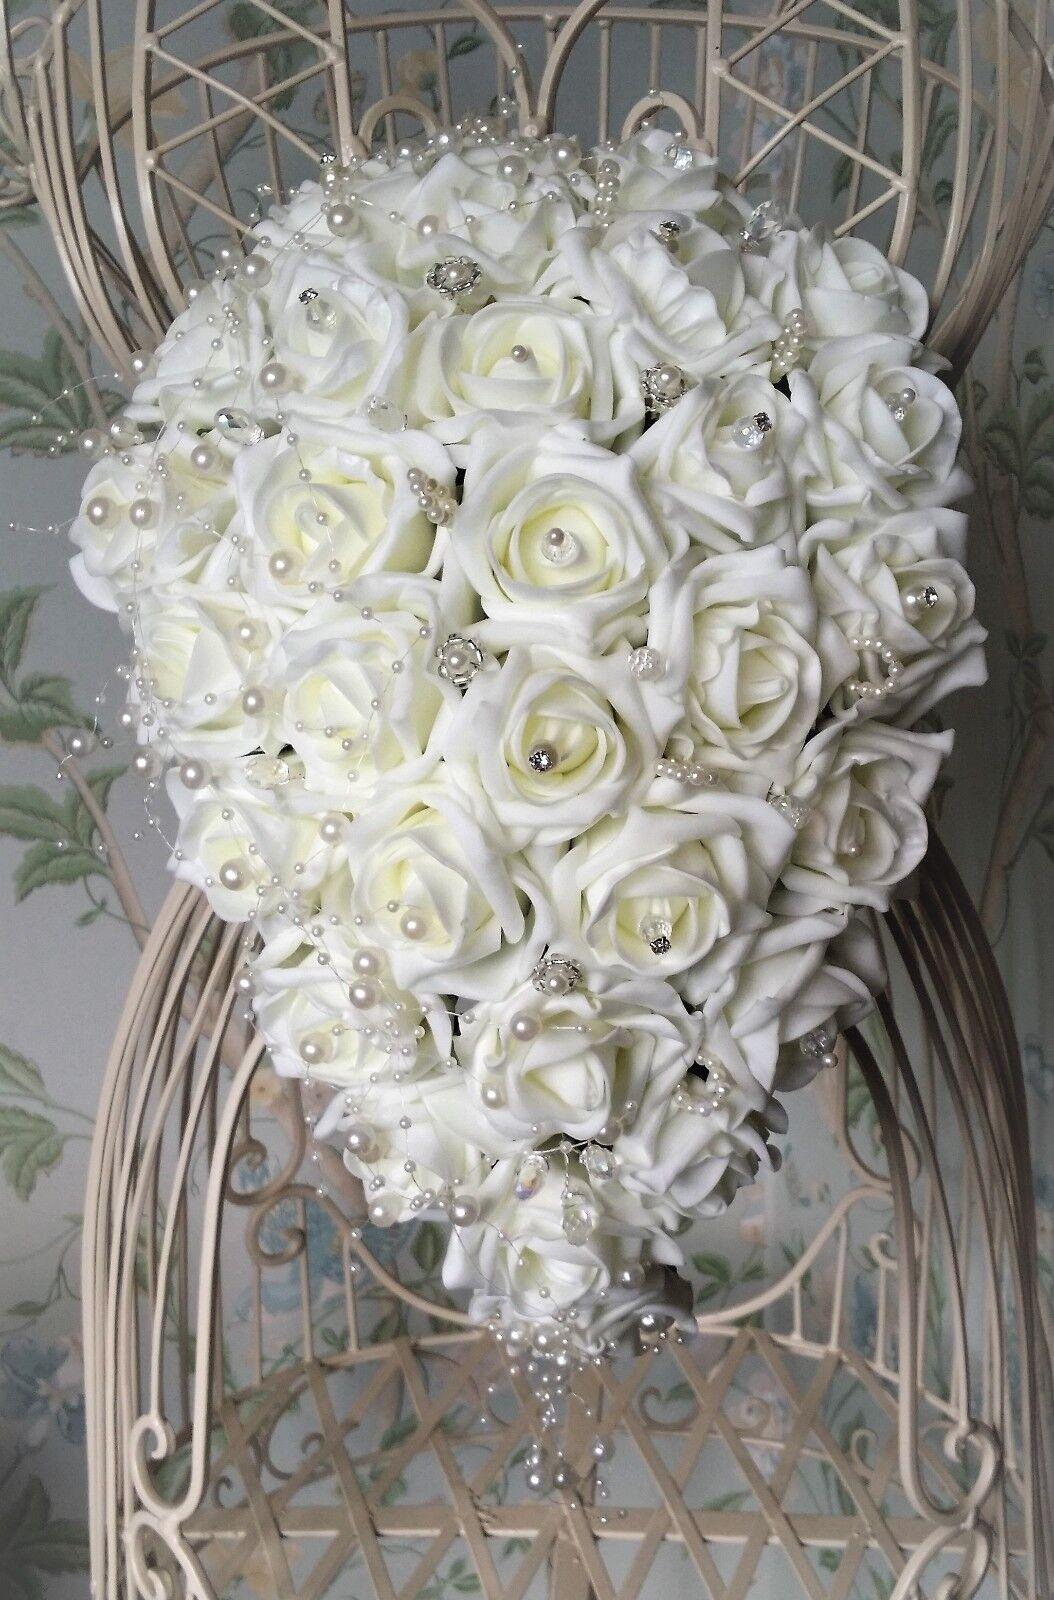 Rose pearl & crystal strass mariées larme mariage bouquet fleurs sparkle